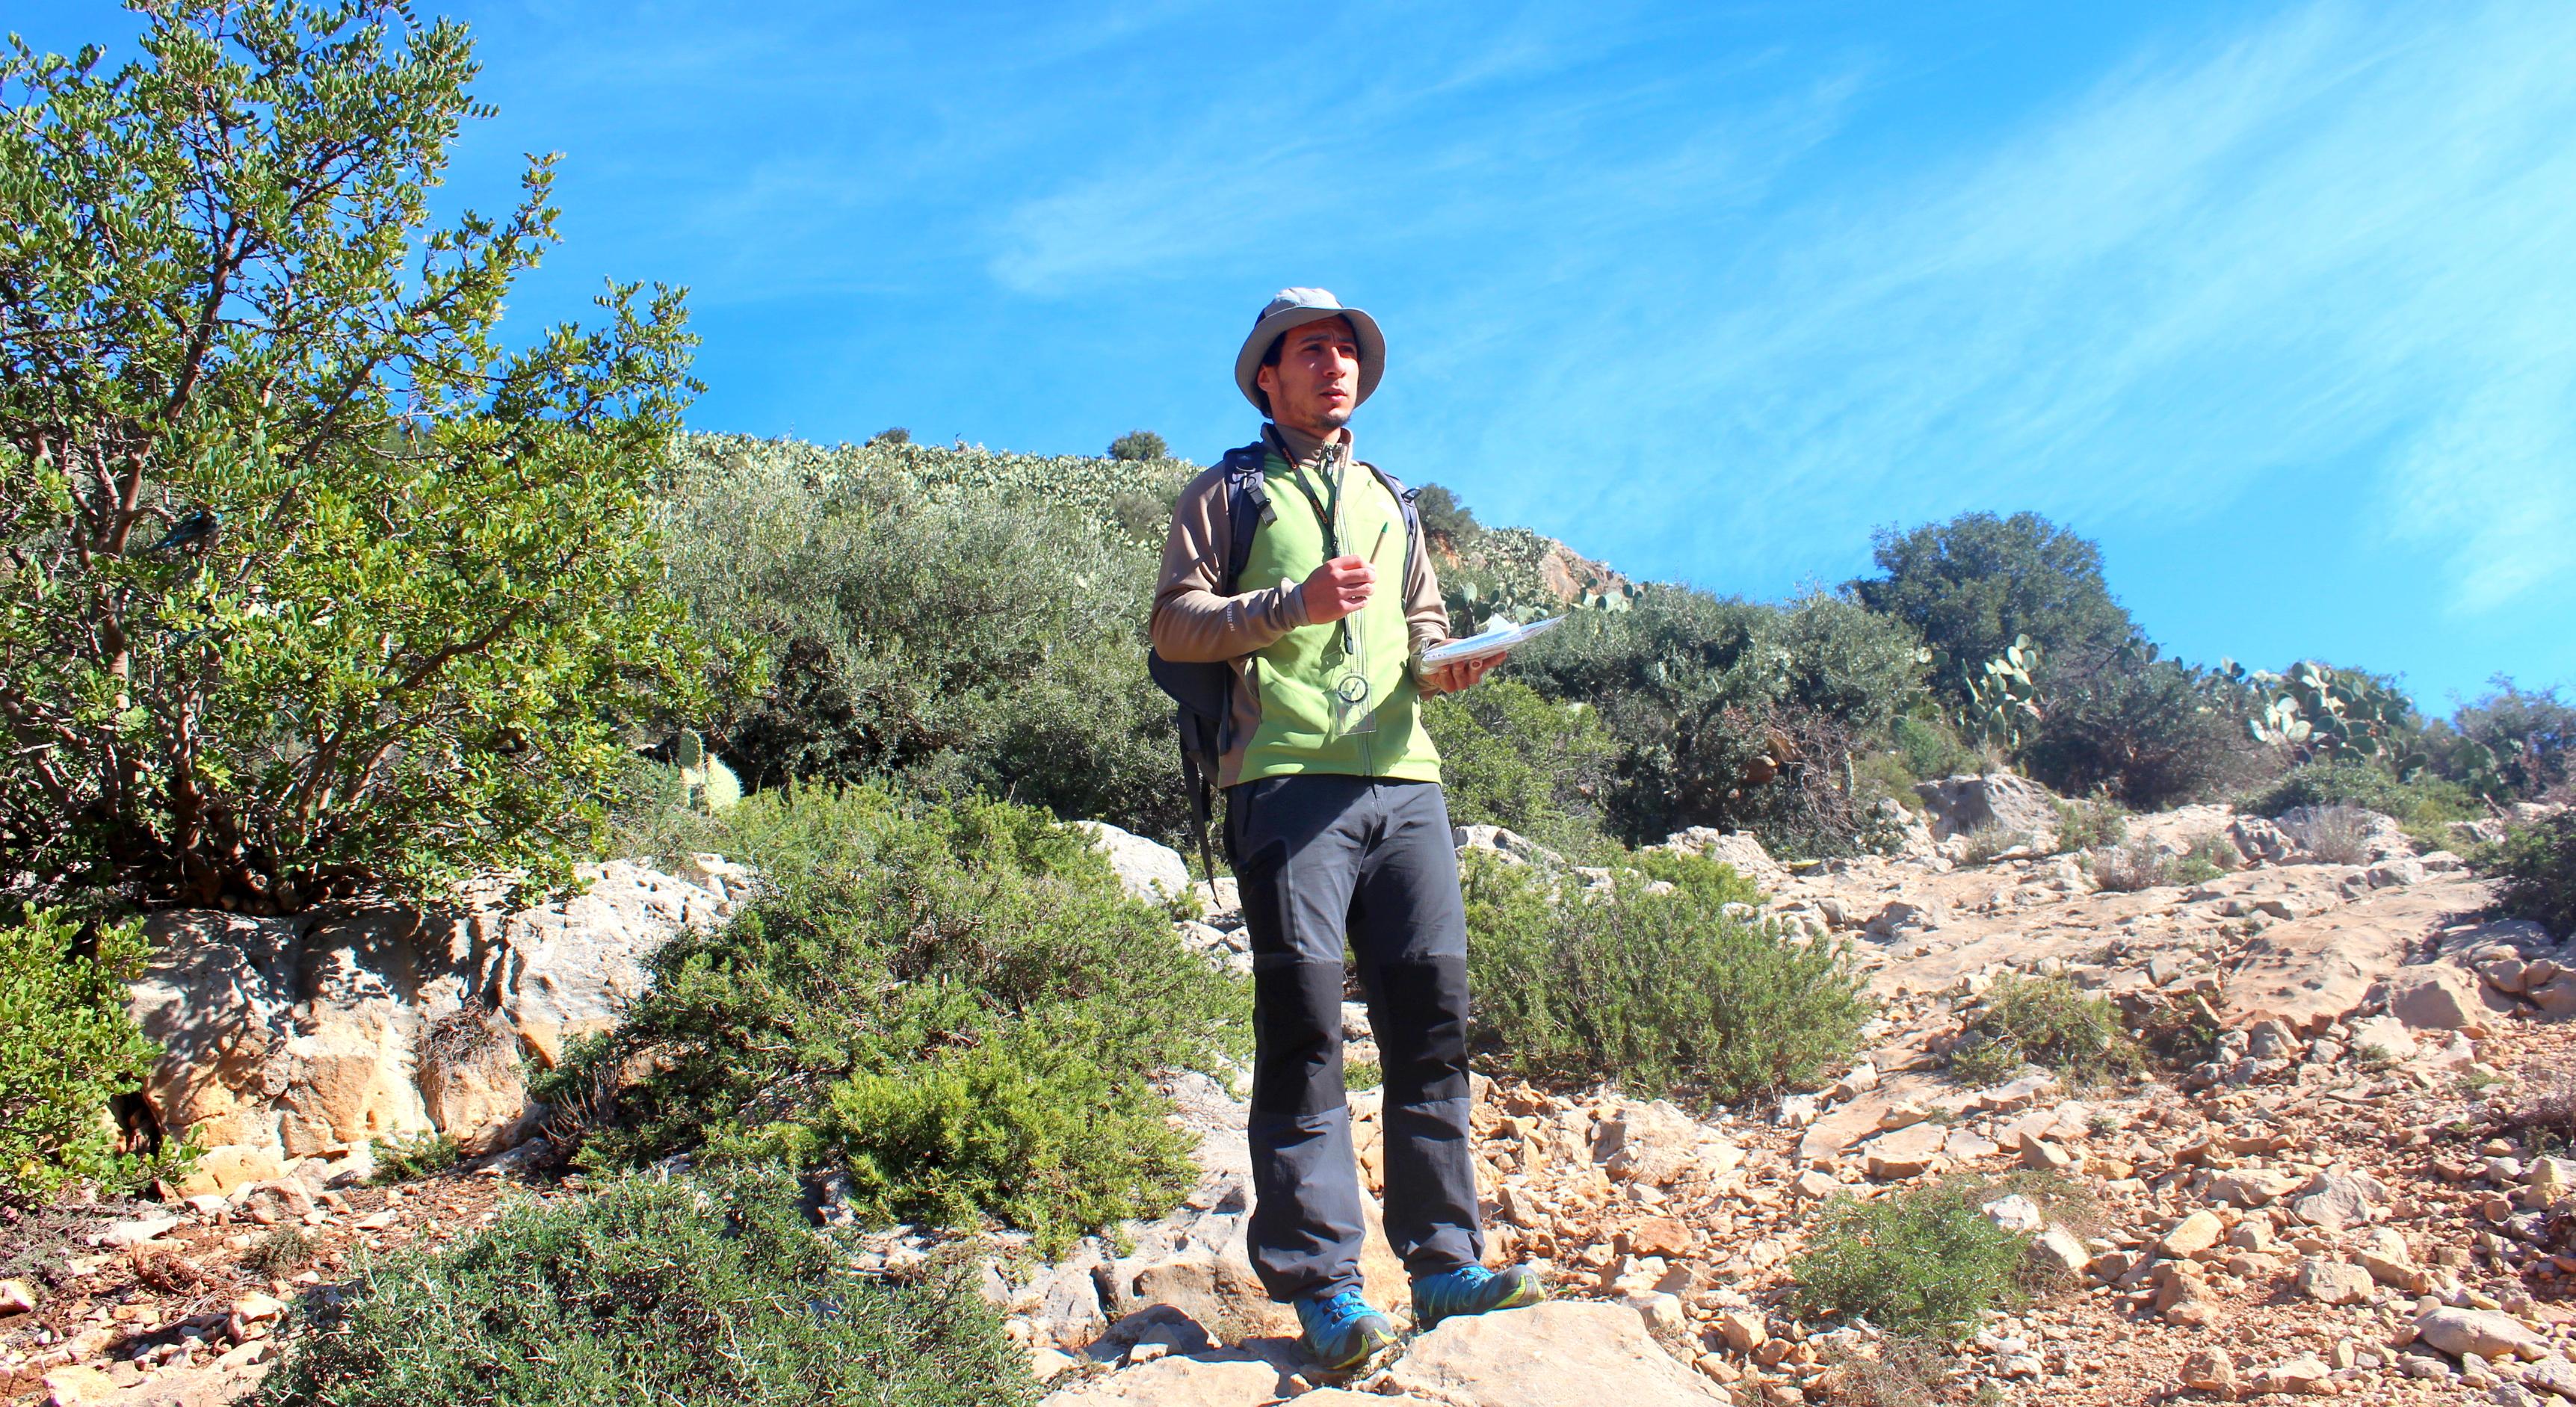 Iskander Chetioui animateur de montagne certifié de l'ATR